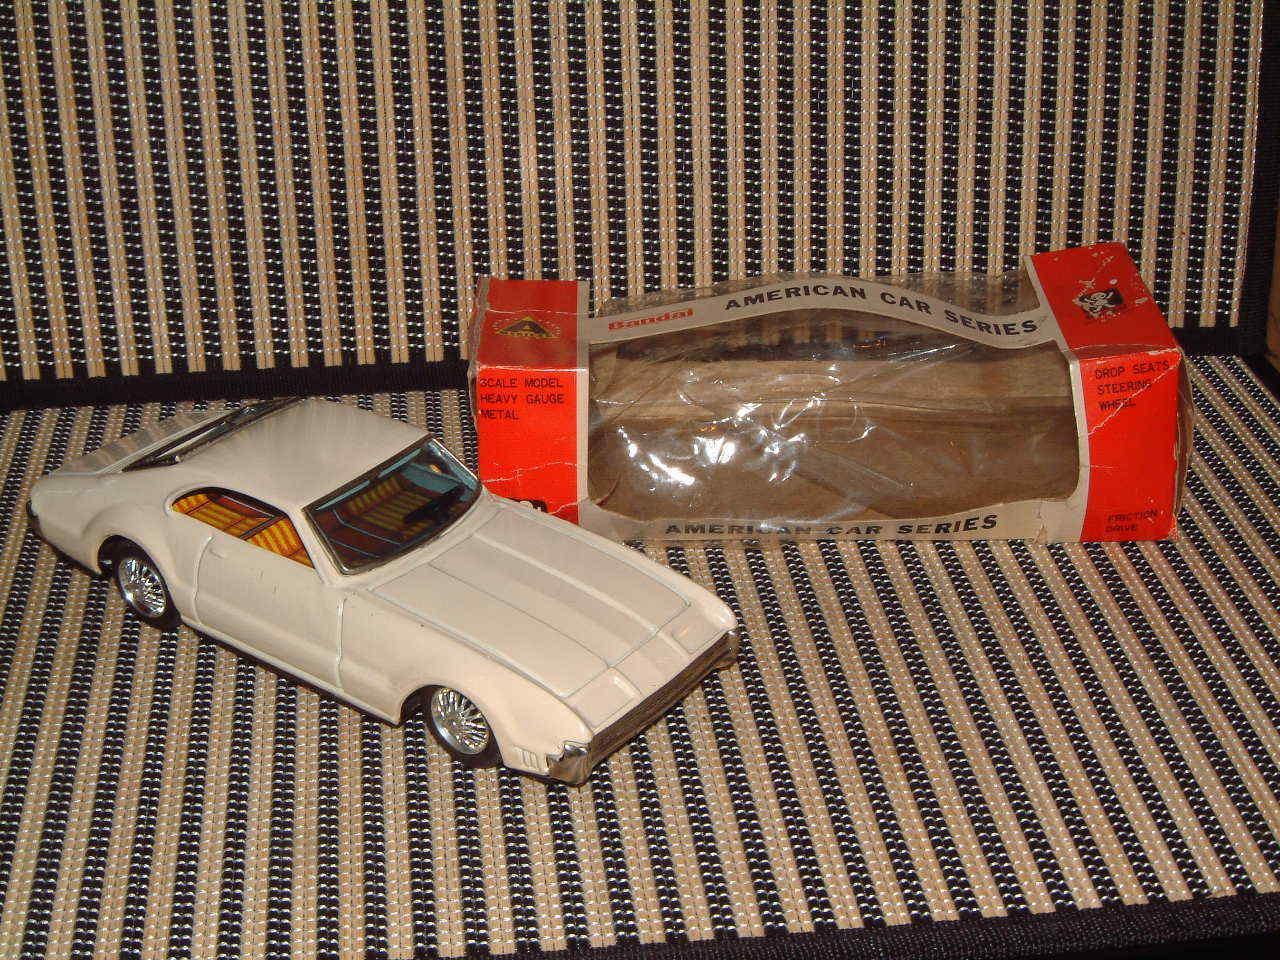 BANDAI FRICTION DRIVE TIN OLDS'  TORONADO  AMERICAN CAR SERIES  W/BOX. WORKING